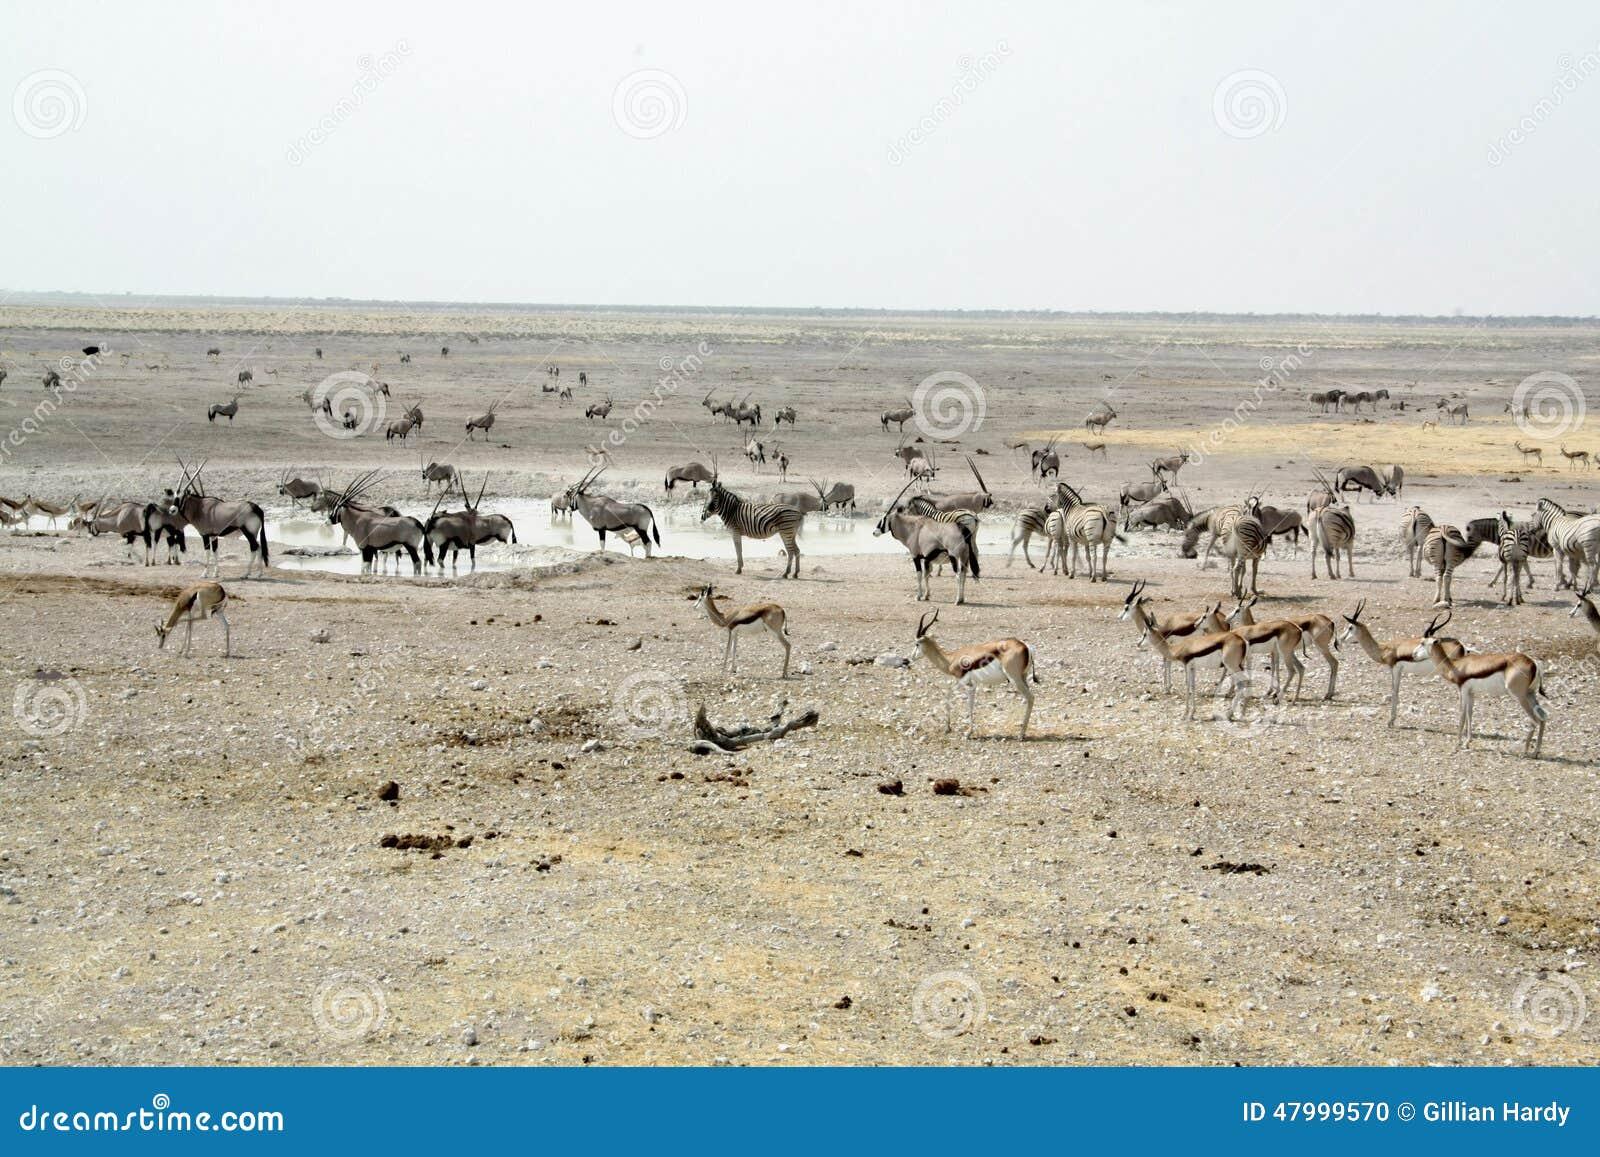 Etosha Waterhole Landscape